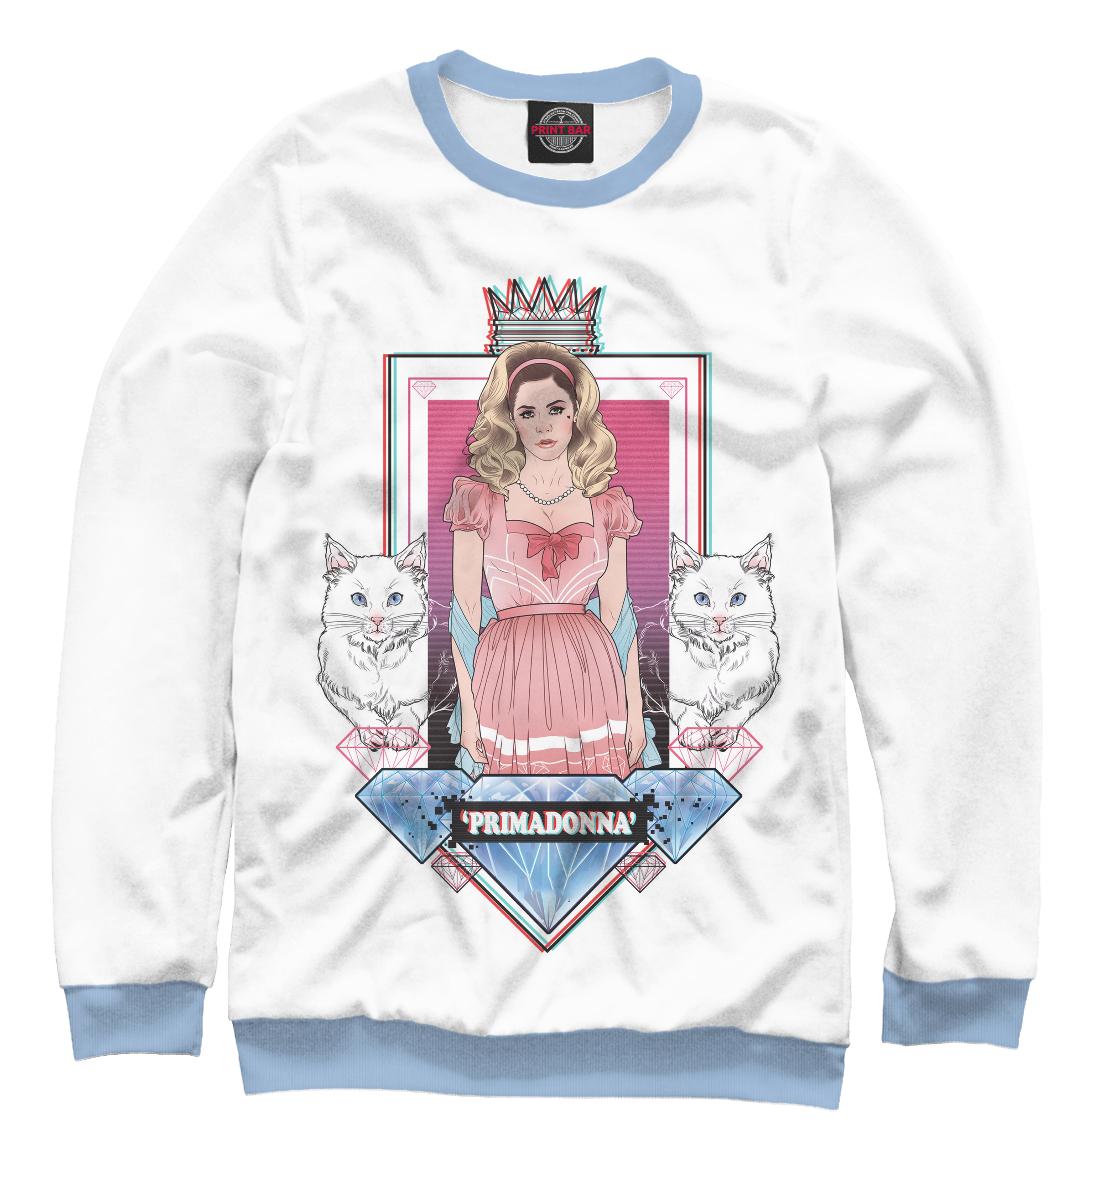 Marina and the diamonds - Primadonna, Printbar, Свитшоты, MZK-612846-swi-1  - купить со скидкой